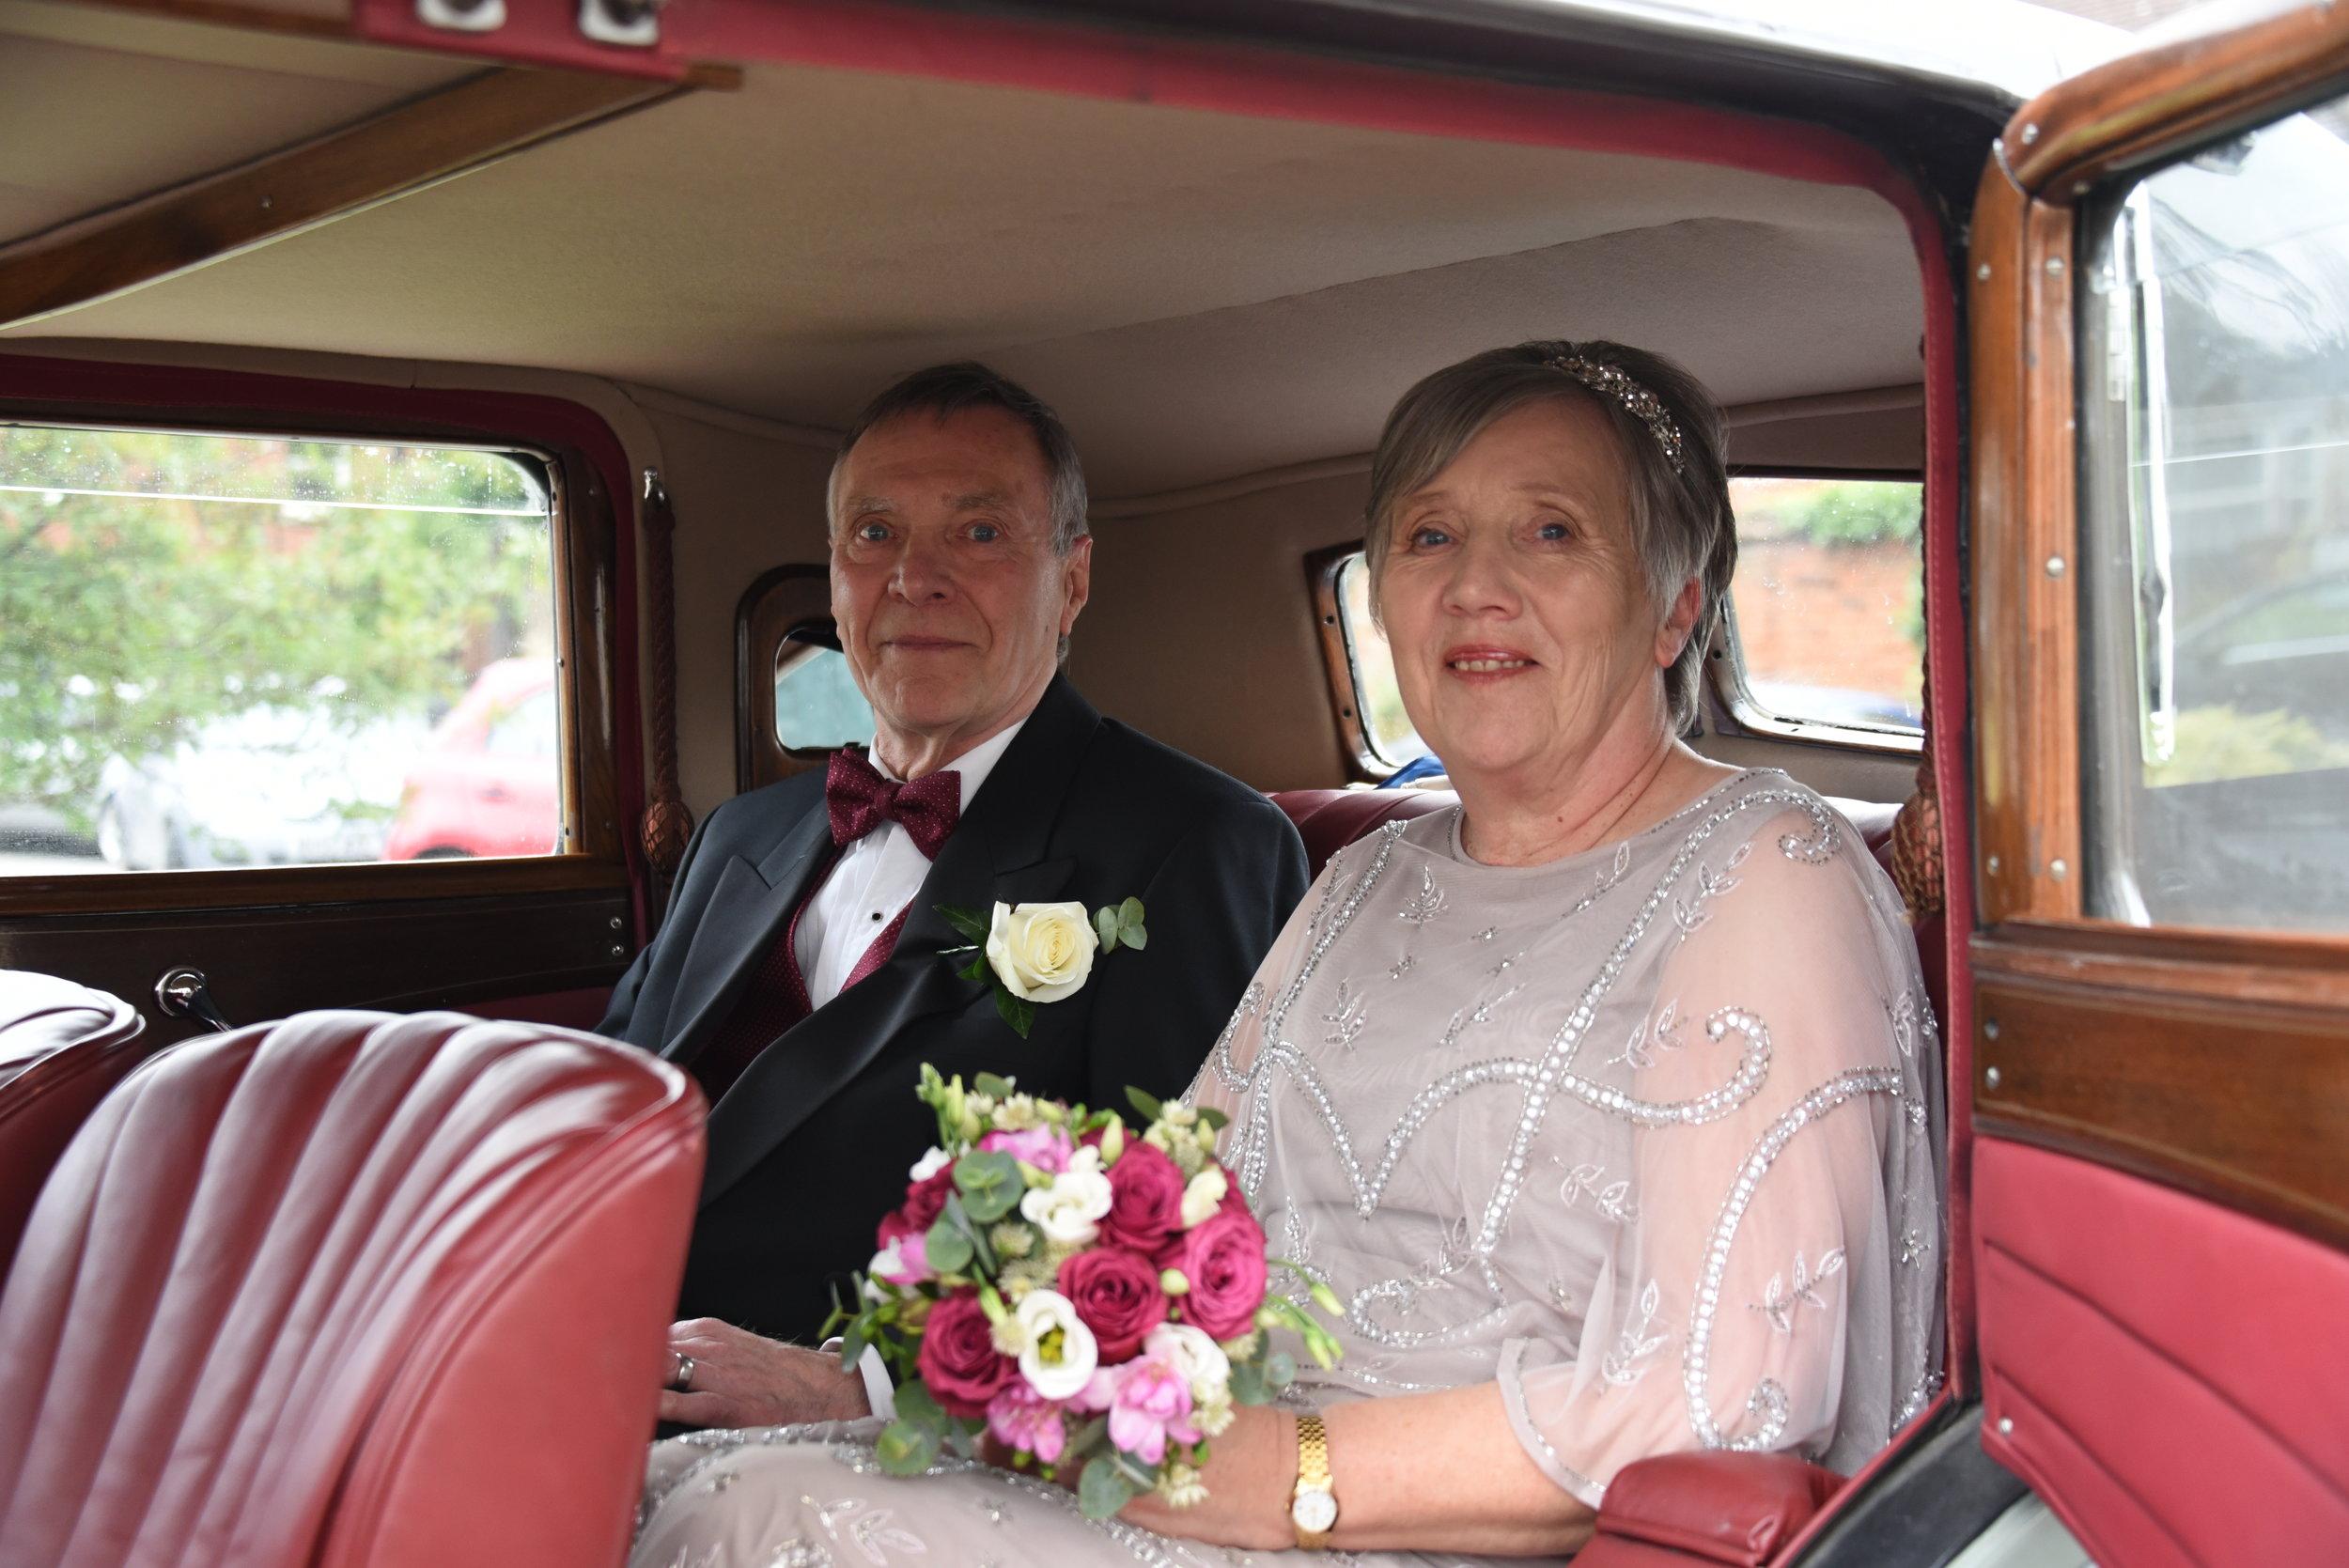 Brenda+Willens+bride+arriving.jpg